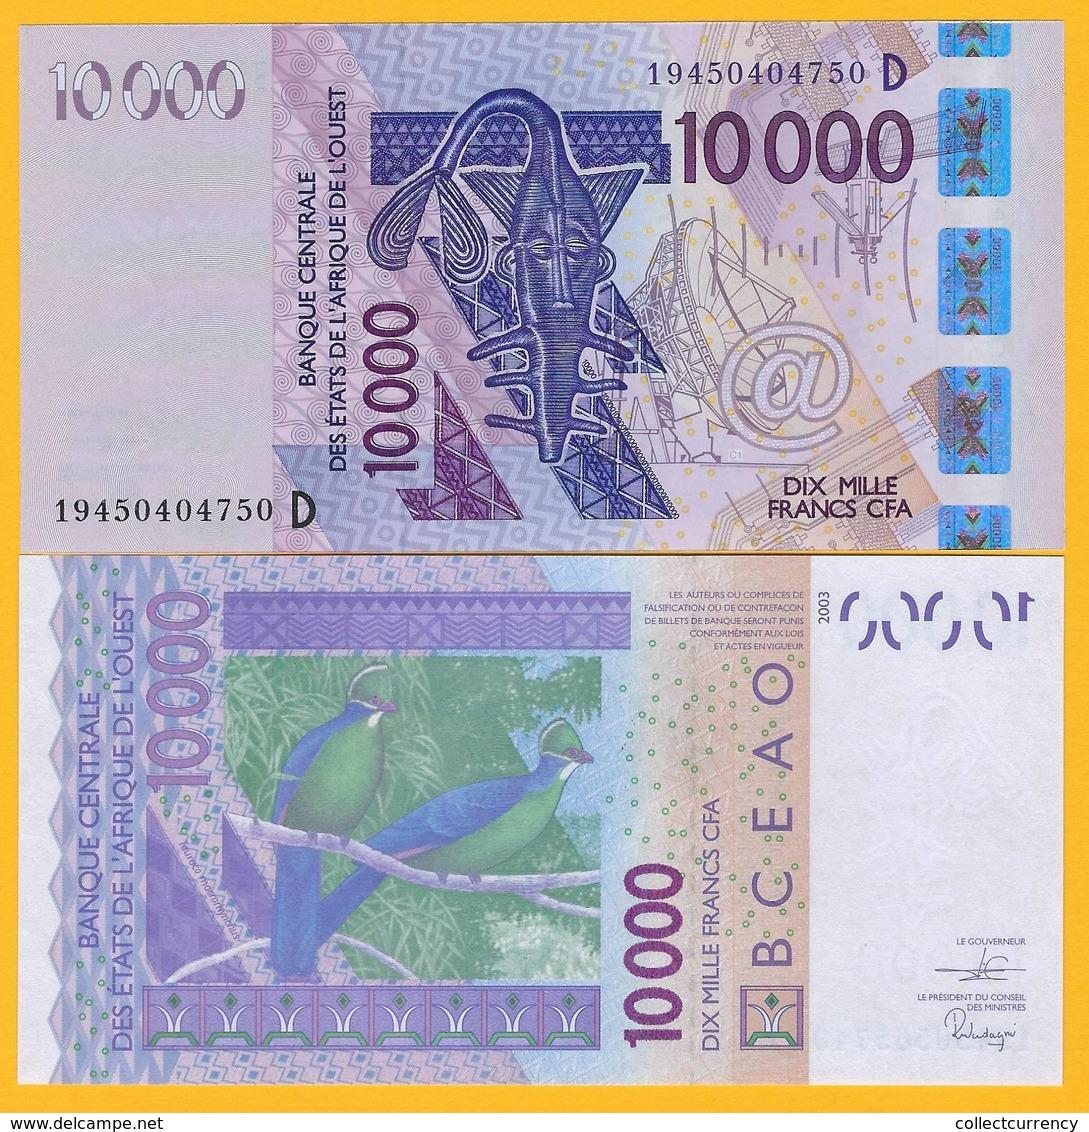 West African States 10000 (10,000) Francs Mali (D) P-418D 2019 UNC Banknote - Estados De Africa Occidental